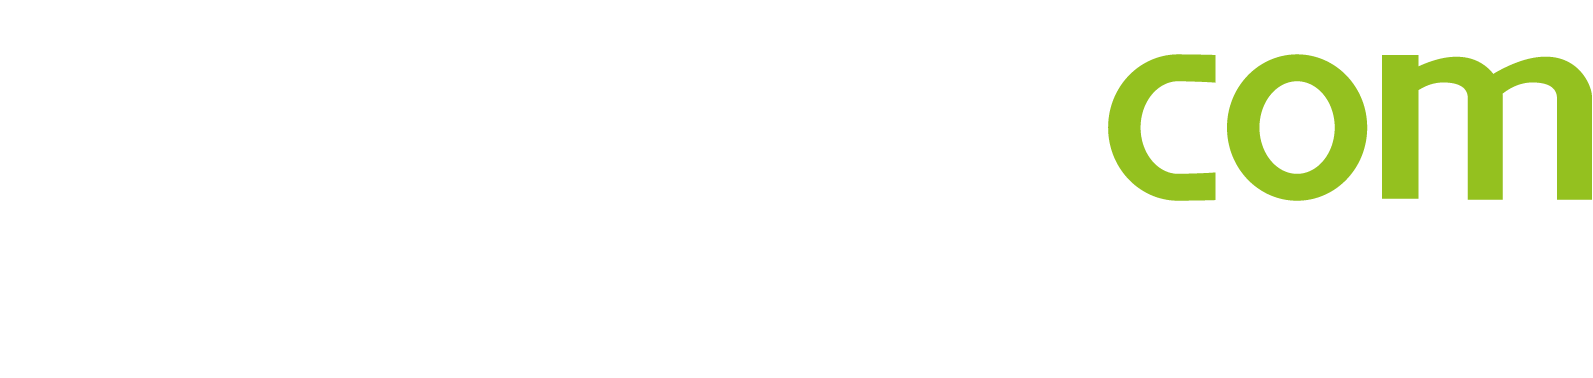 Lapalingo Review Logo